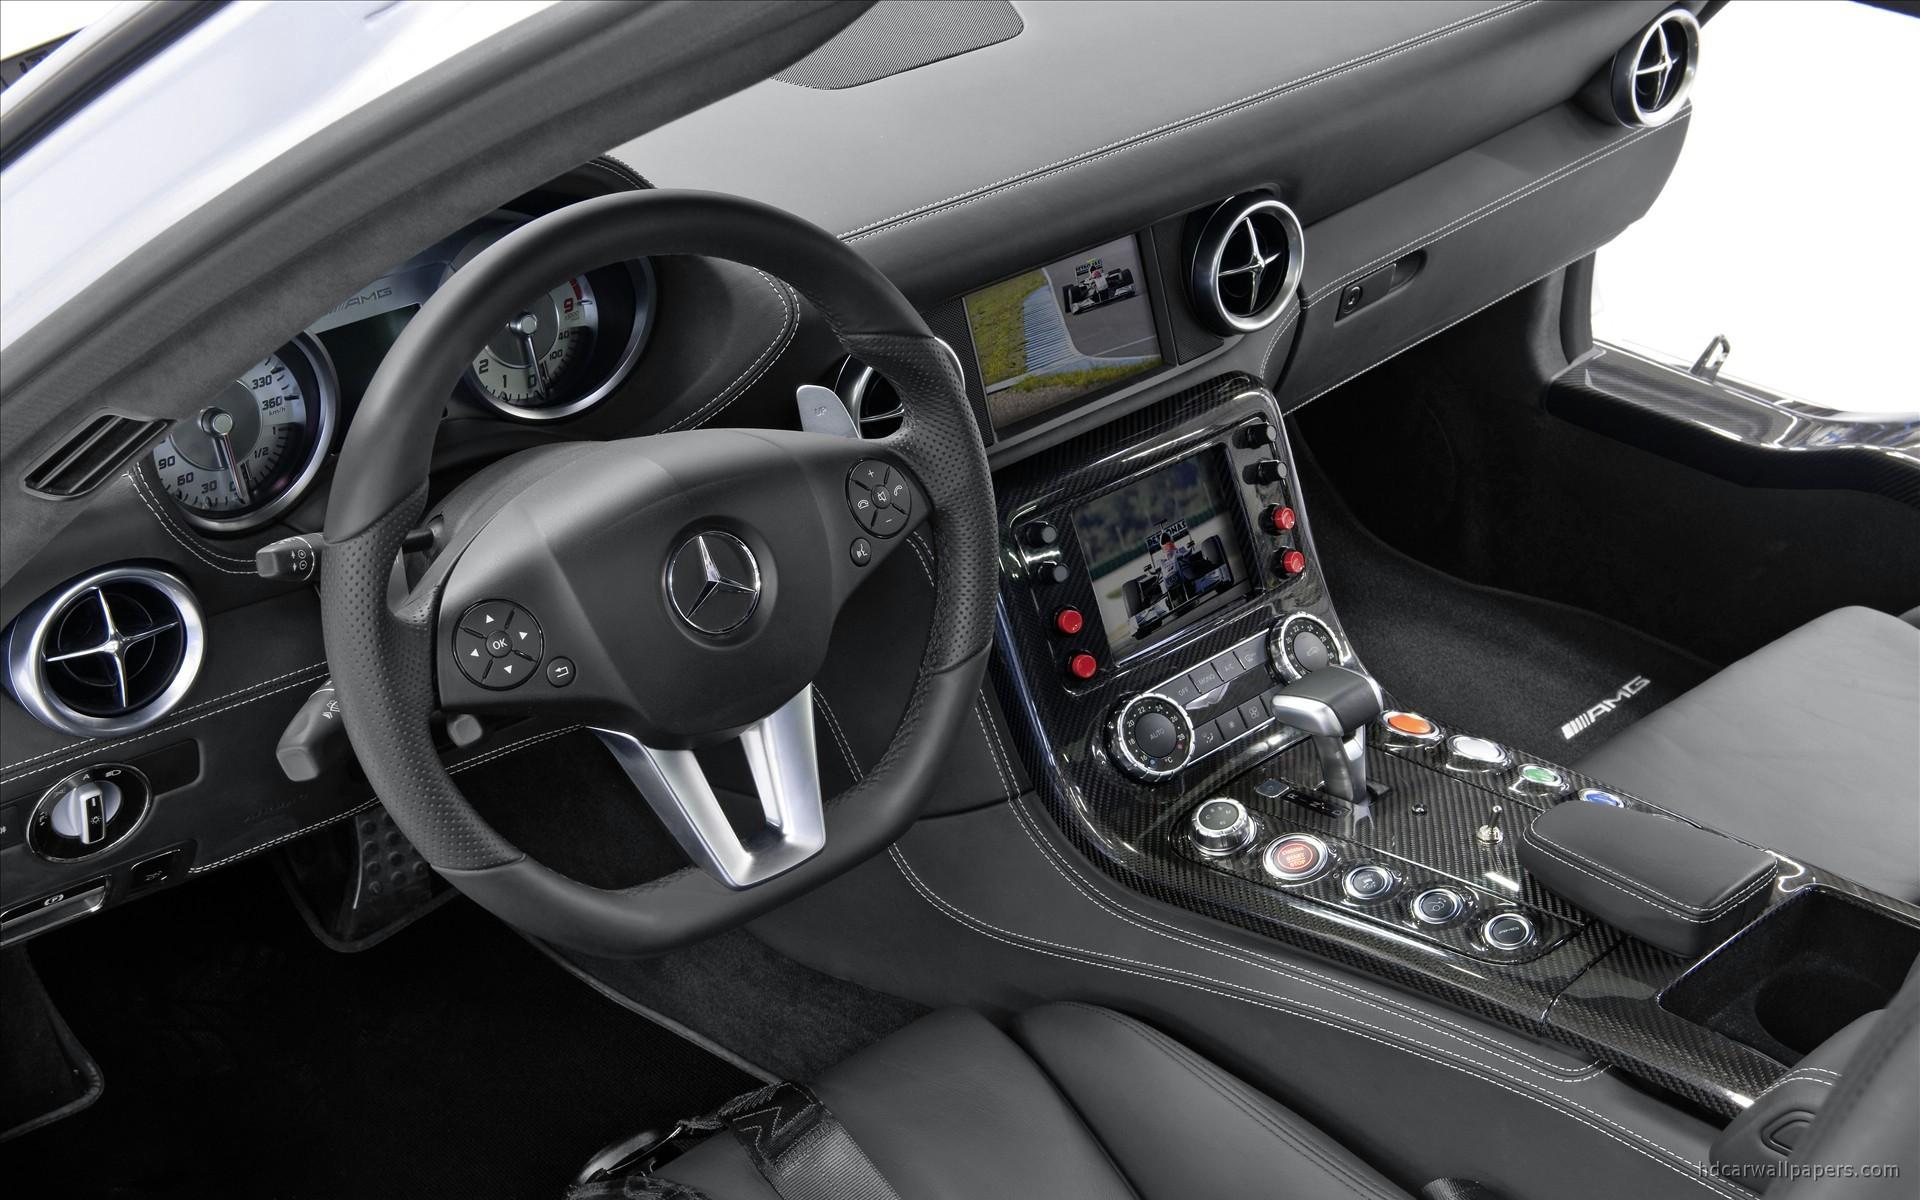 Iphone X Inside Wallpaper Hd 2010 Mercedes Benz Sls Amg F1 Safety Car Interior